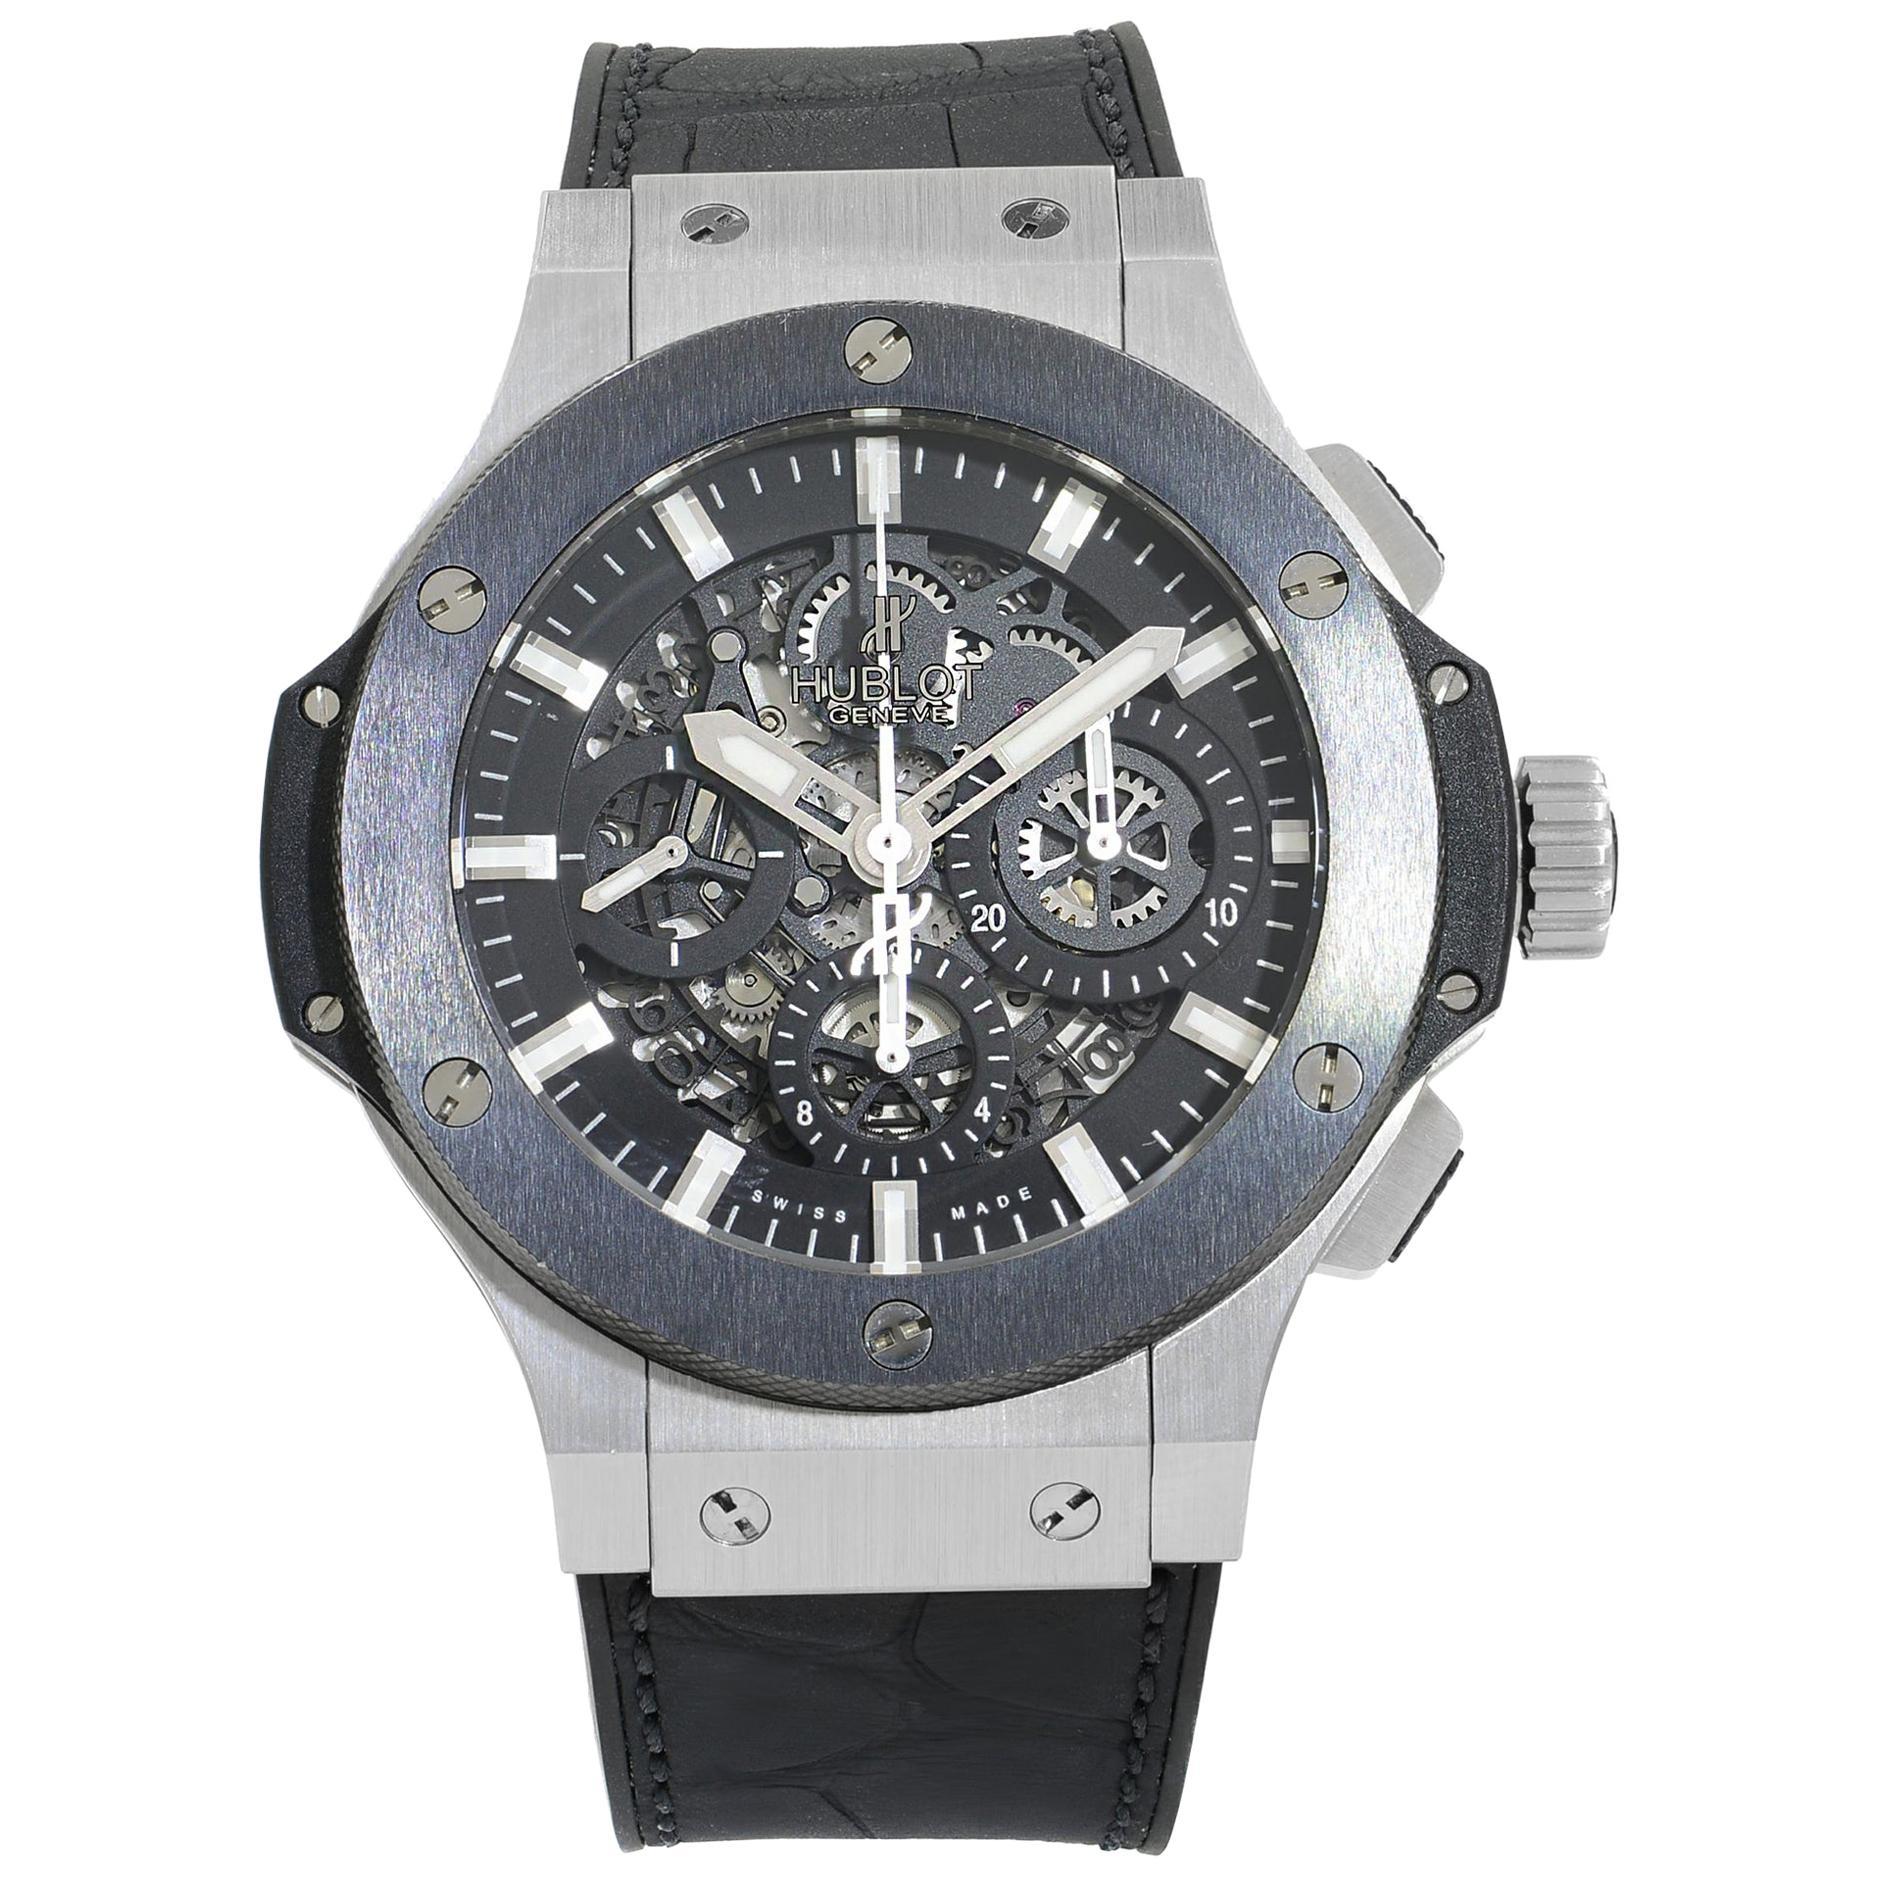 Hublot Big Bang Aero Black Skeleton Steel Automatic Men's Watch 311.SM.1170.GR